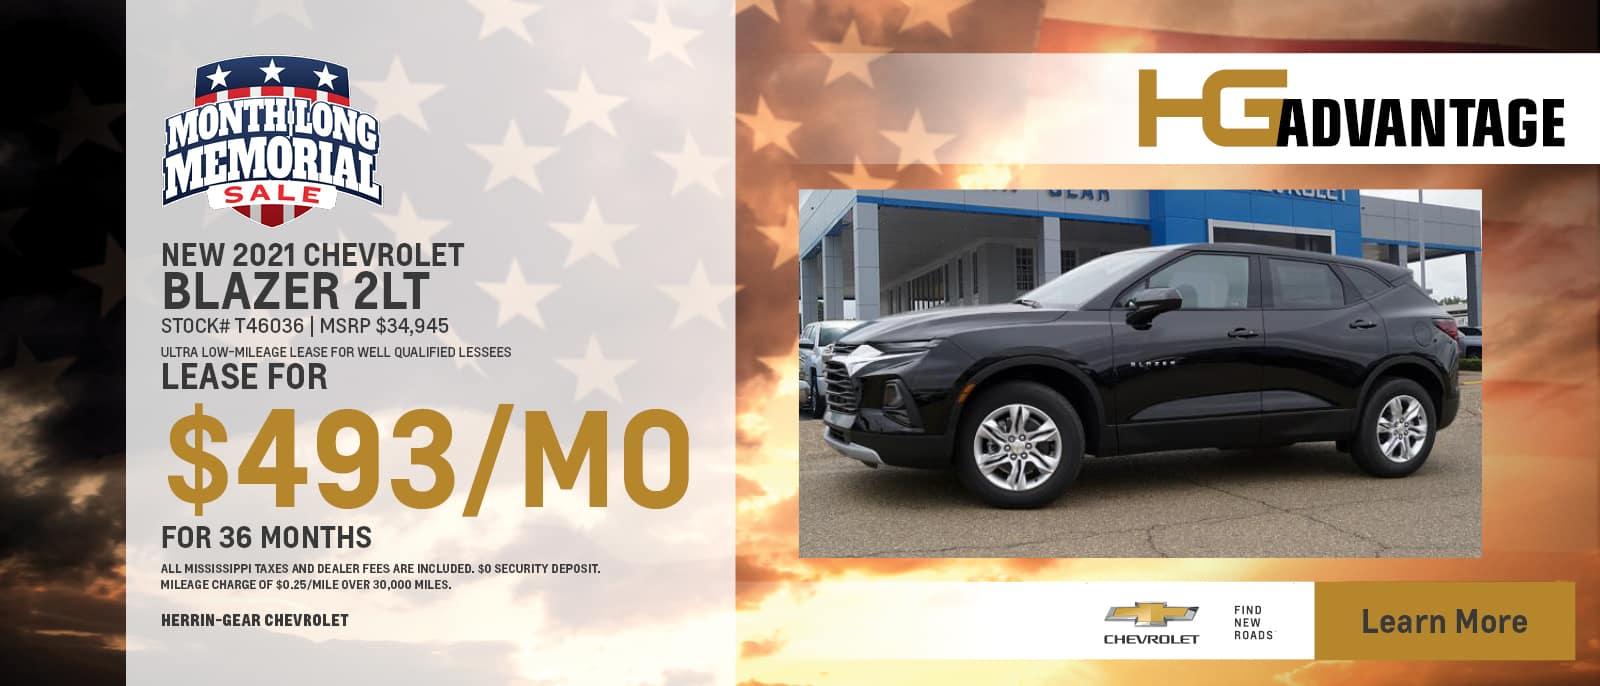 2021 Chevy Blazer 2LT